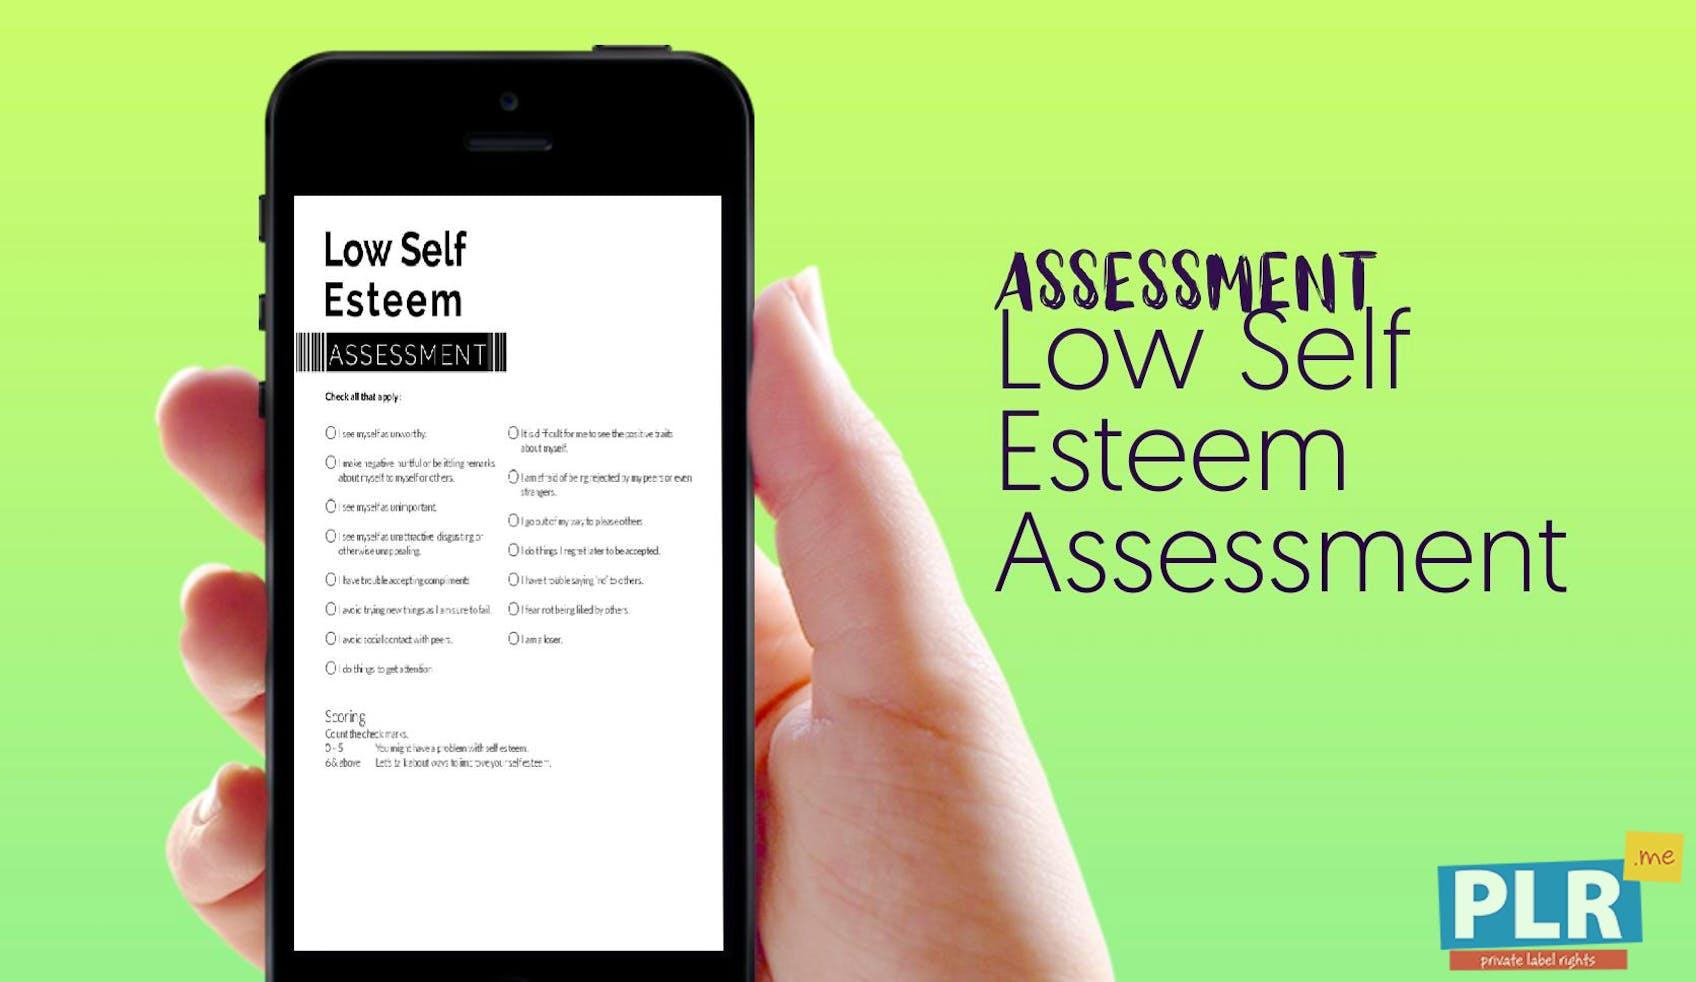 Low Self Esteem Assessment